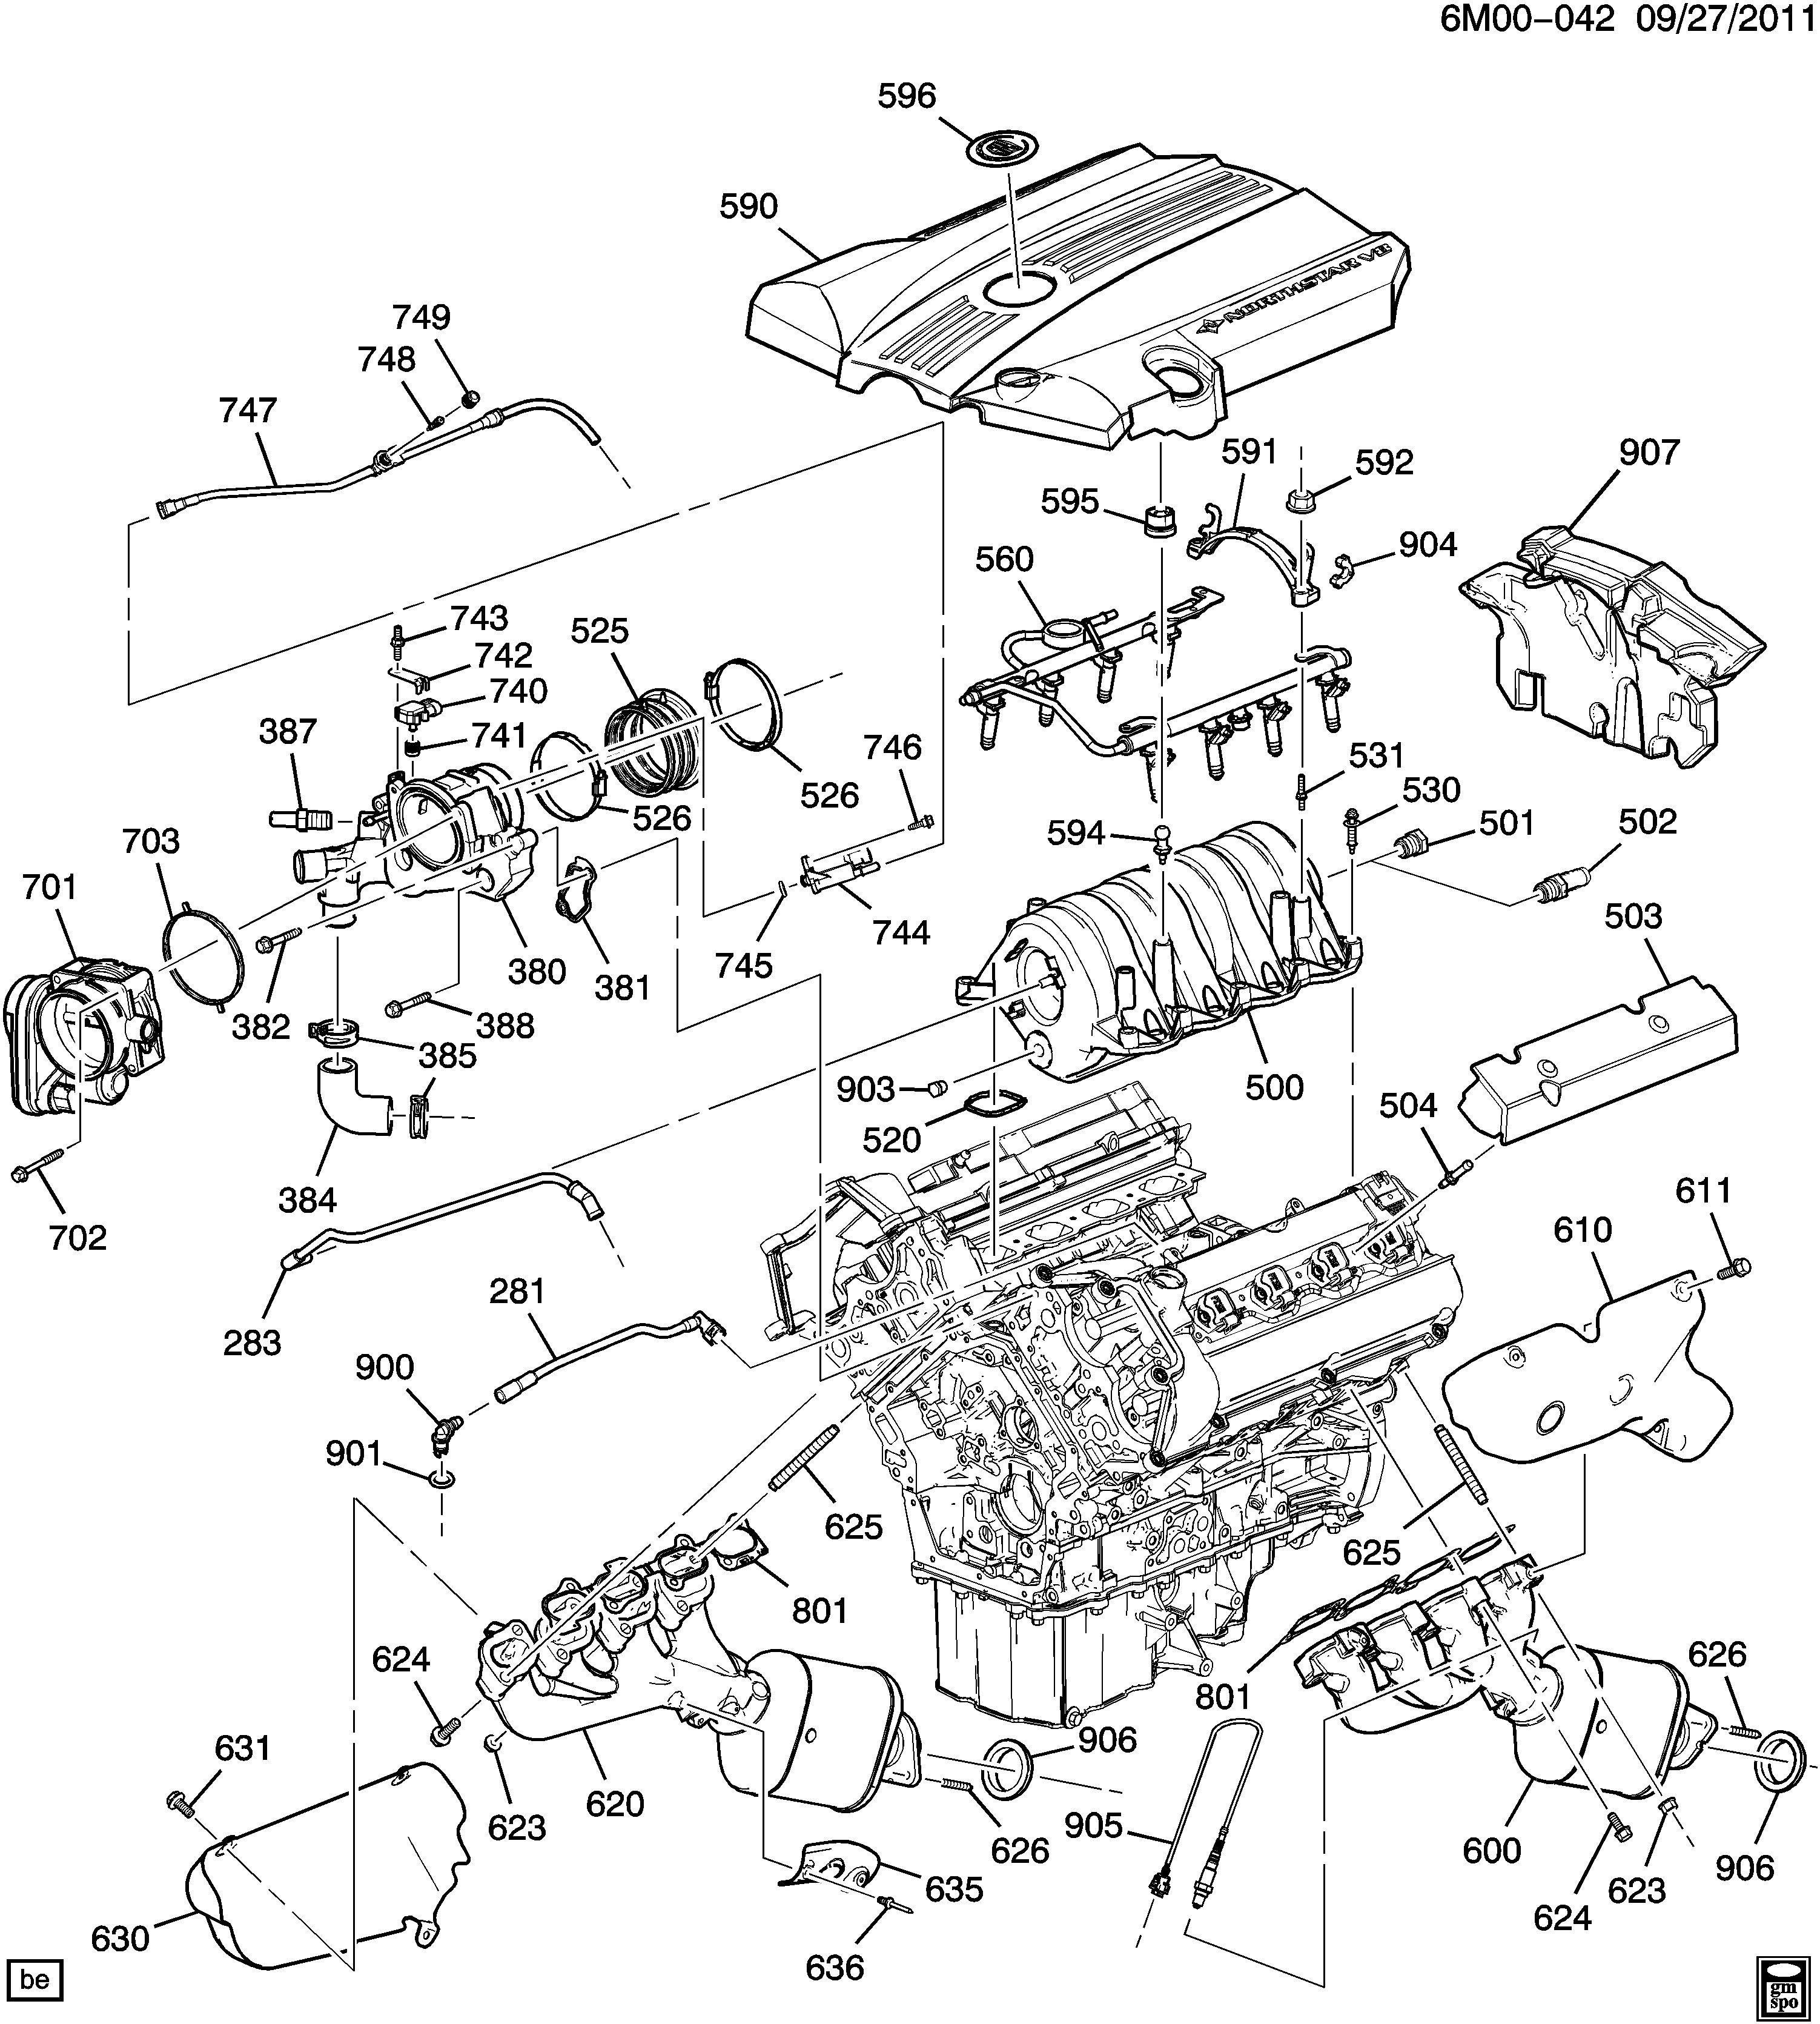 oa_1483] 2002 cadillac deville 2008 saturn vue parts diagram ... cadillac engine schematics northstar engine coolant flow diagram lectu phot garna mohammedshrine librar wiring 101